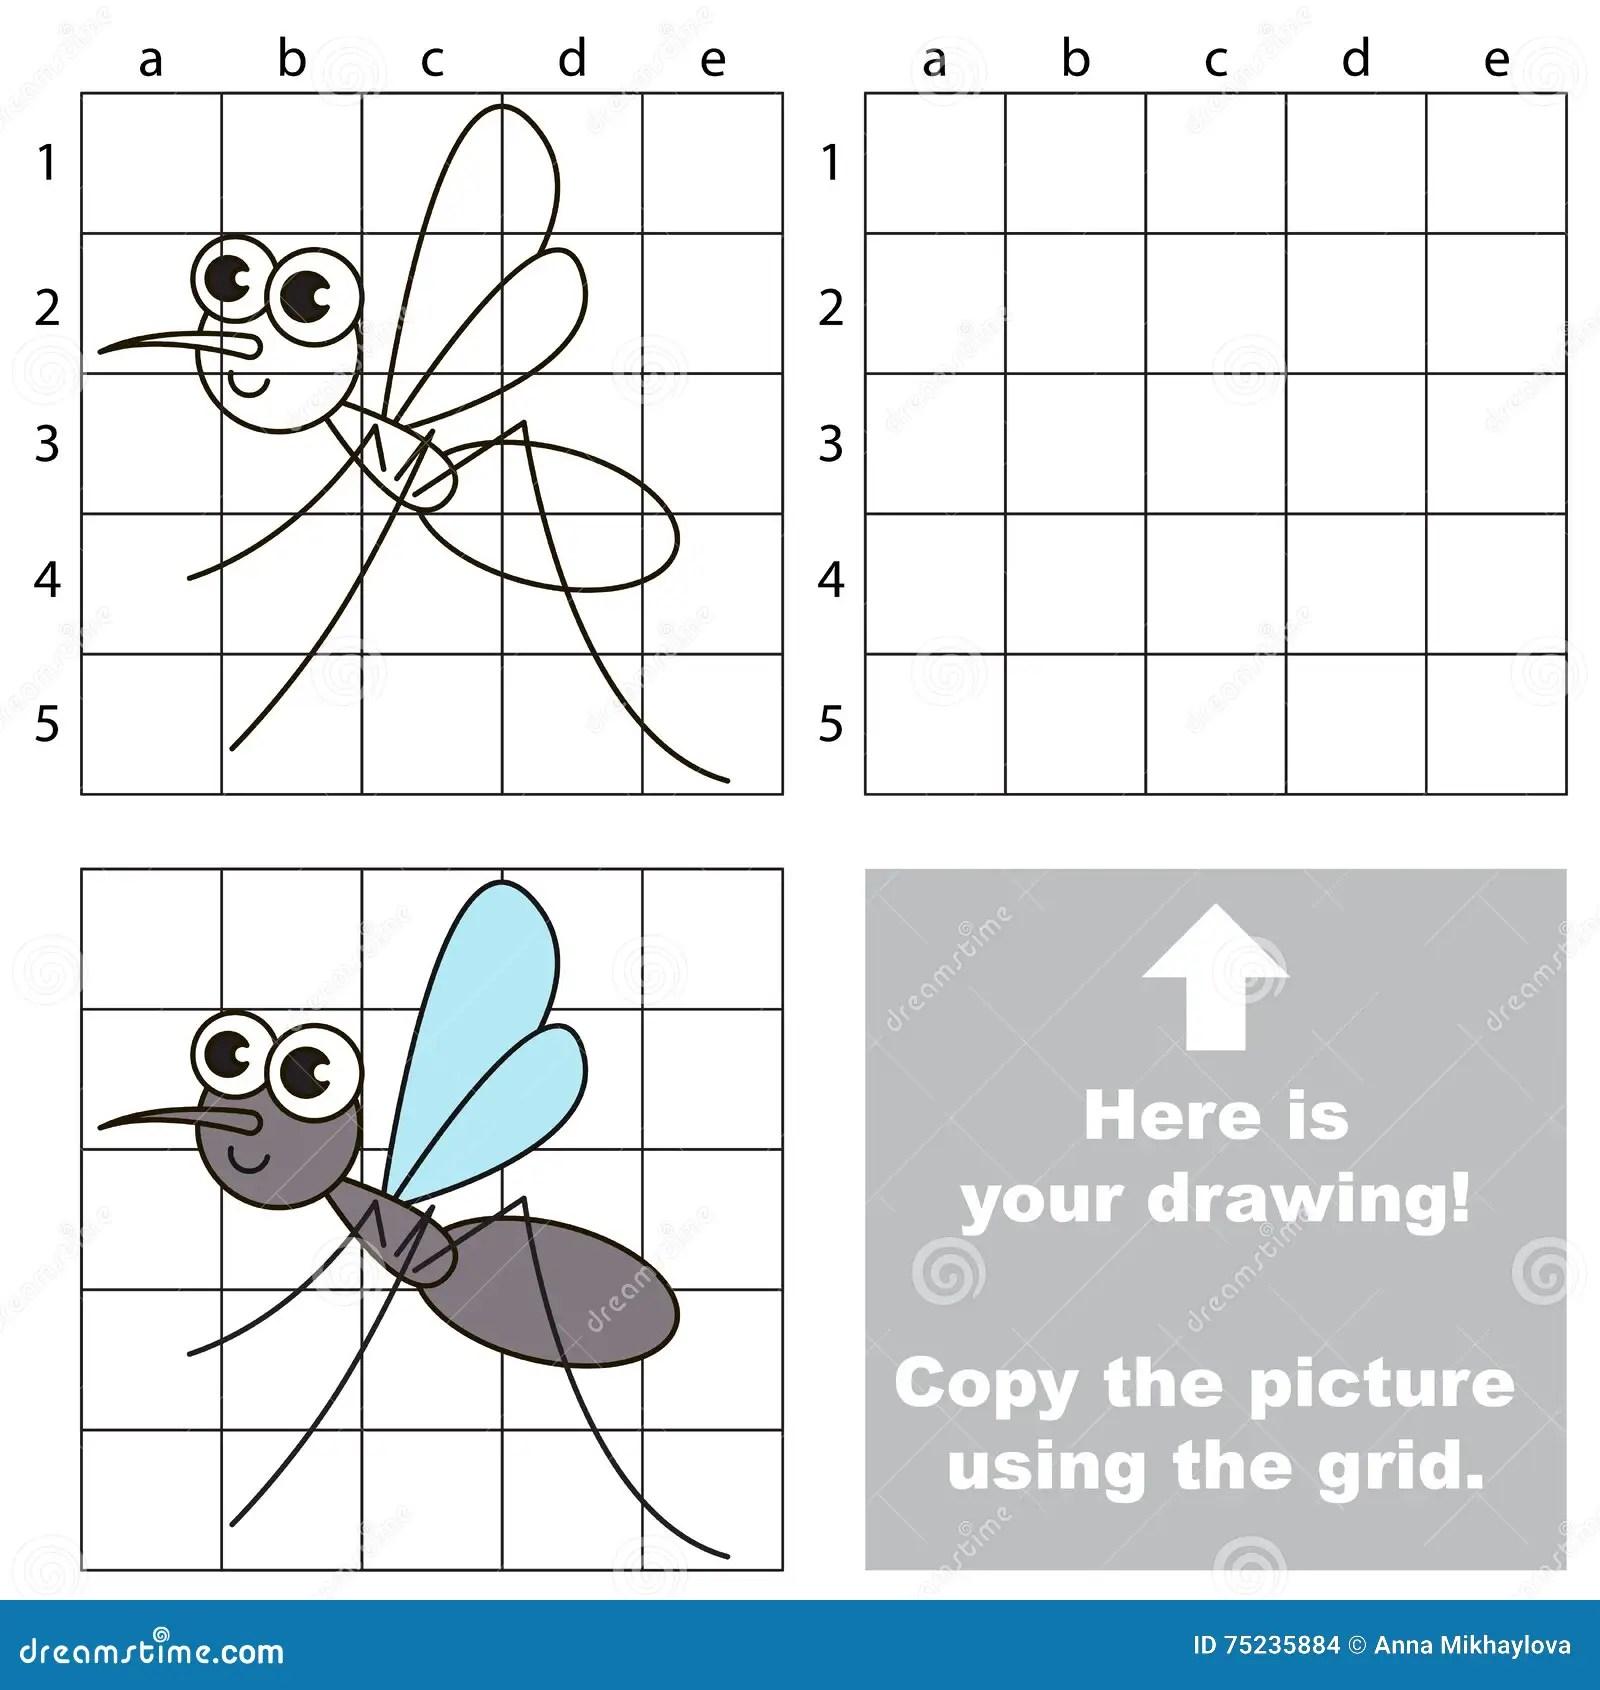 Grid Copy Children Educational Game Drawing Kids Activity Cartoon Vector